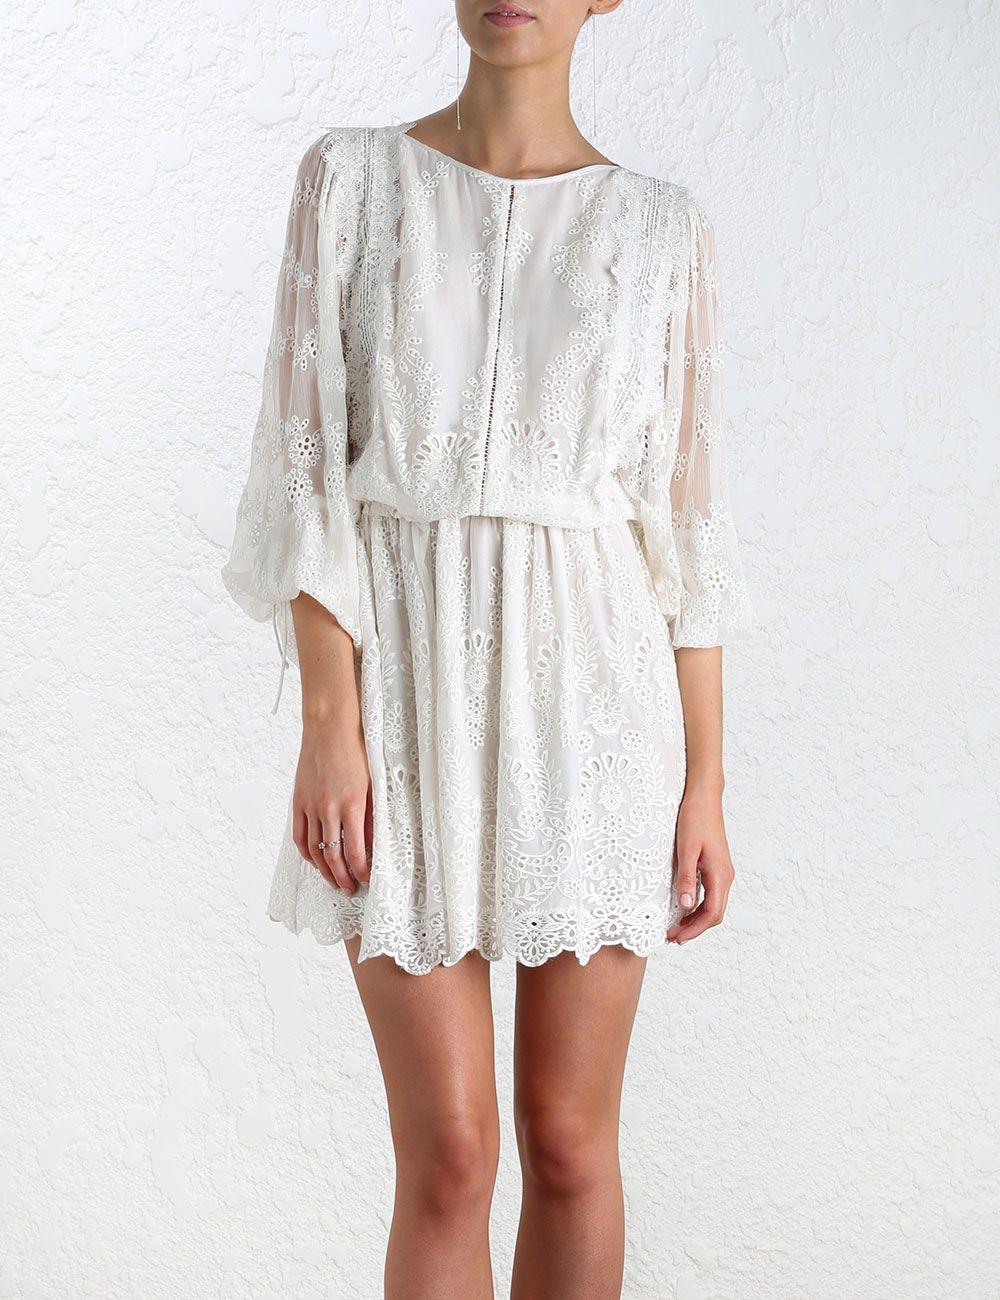 74370374f21 Image result for Zimmermann Women s White Alchemy Twine Dress ...